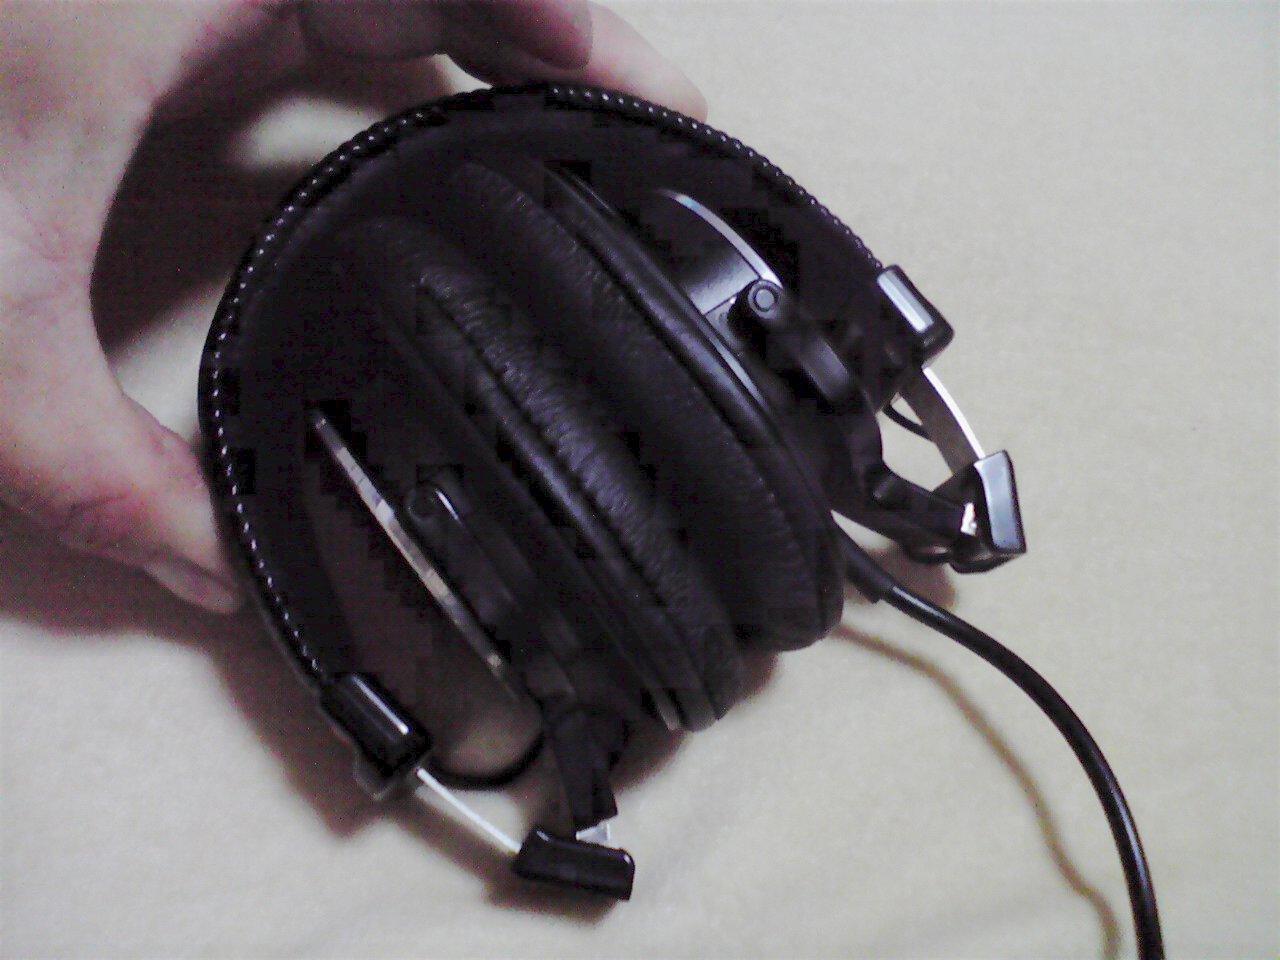 Mdr-cd900st 14